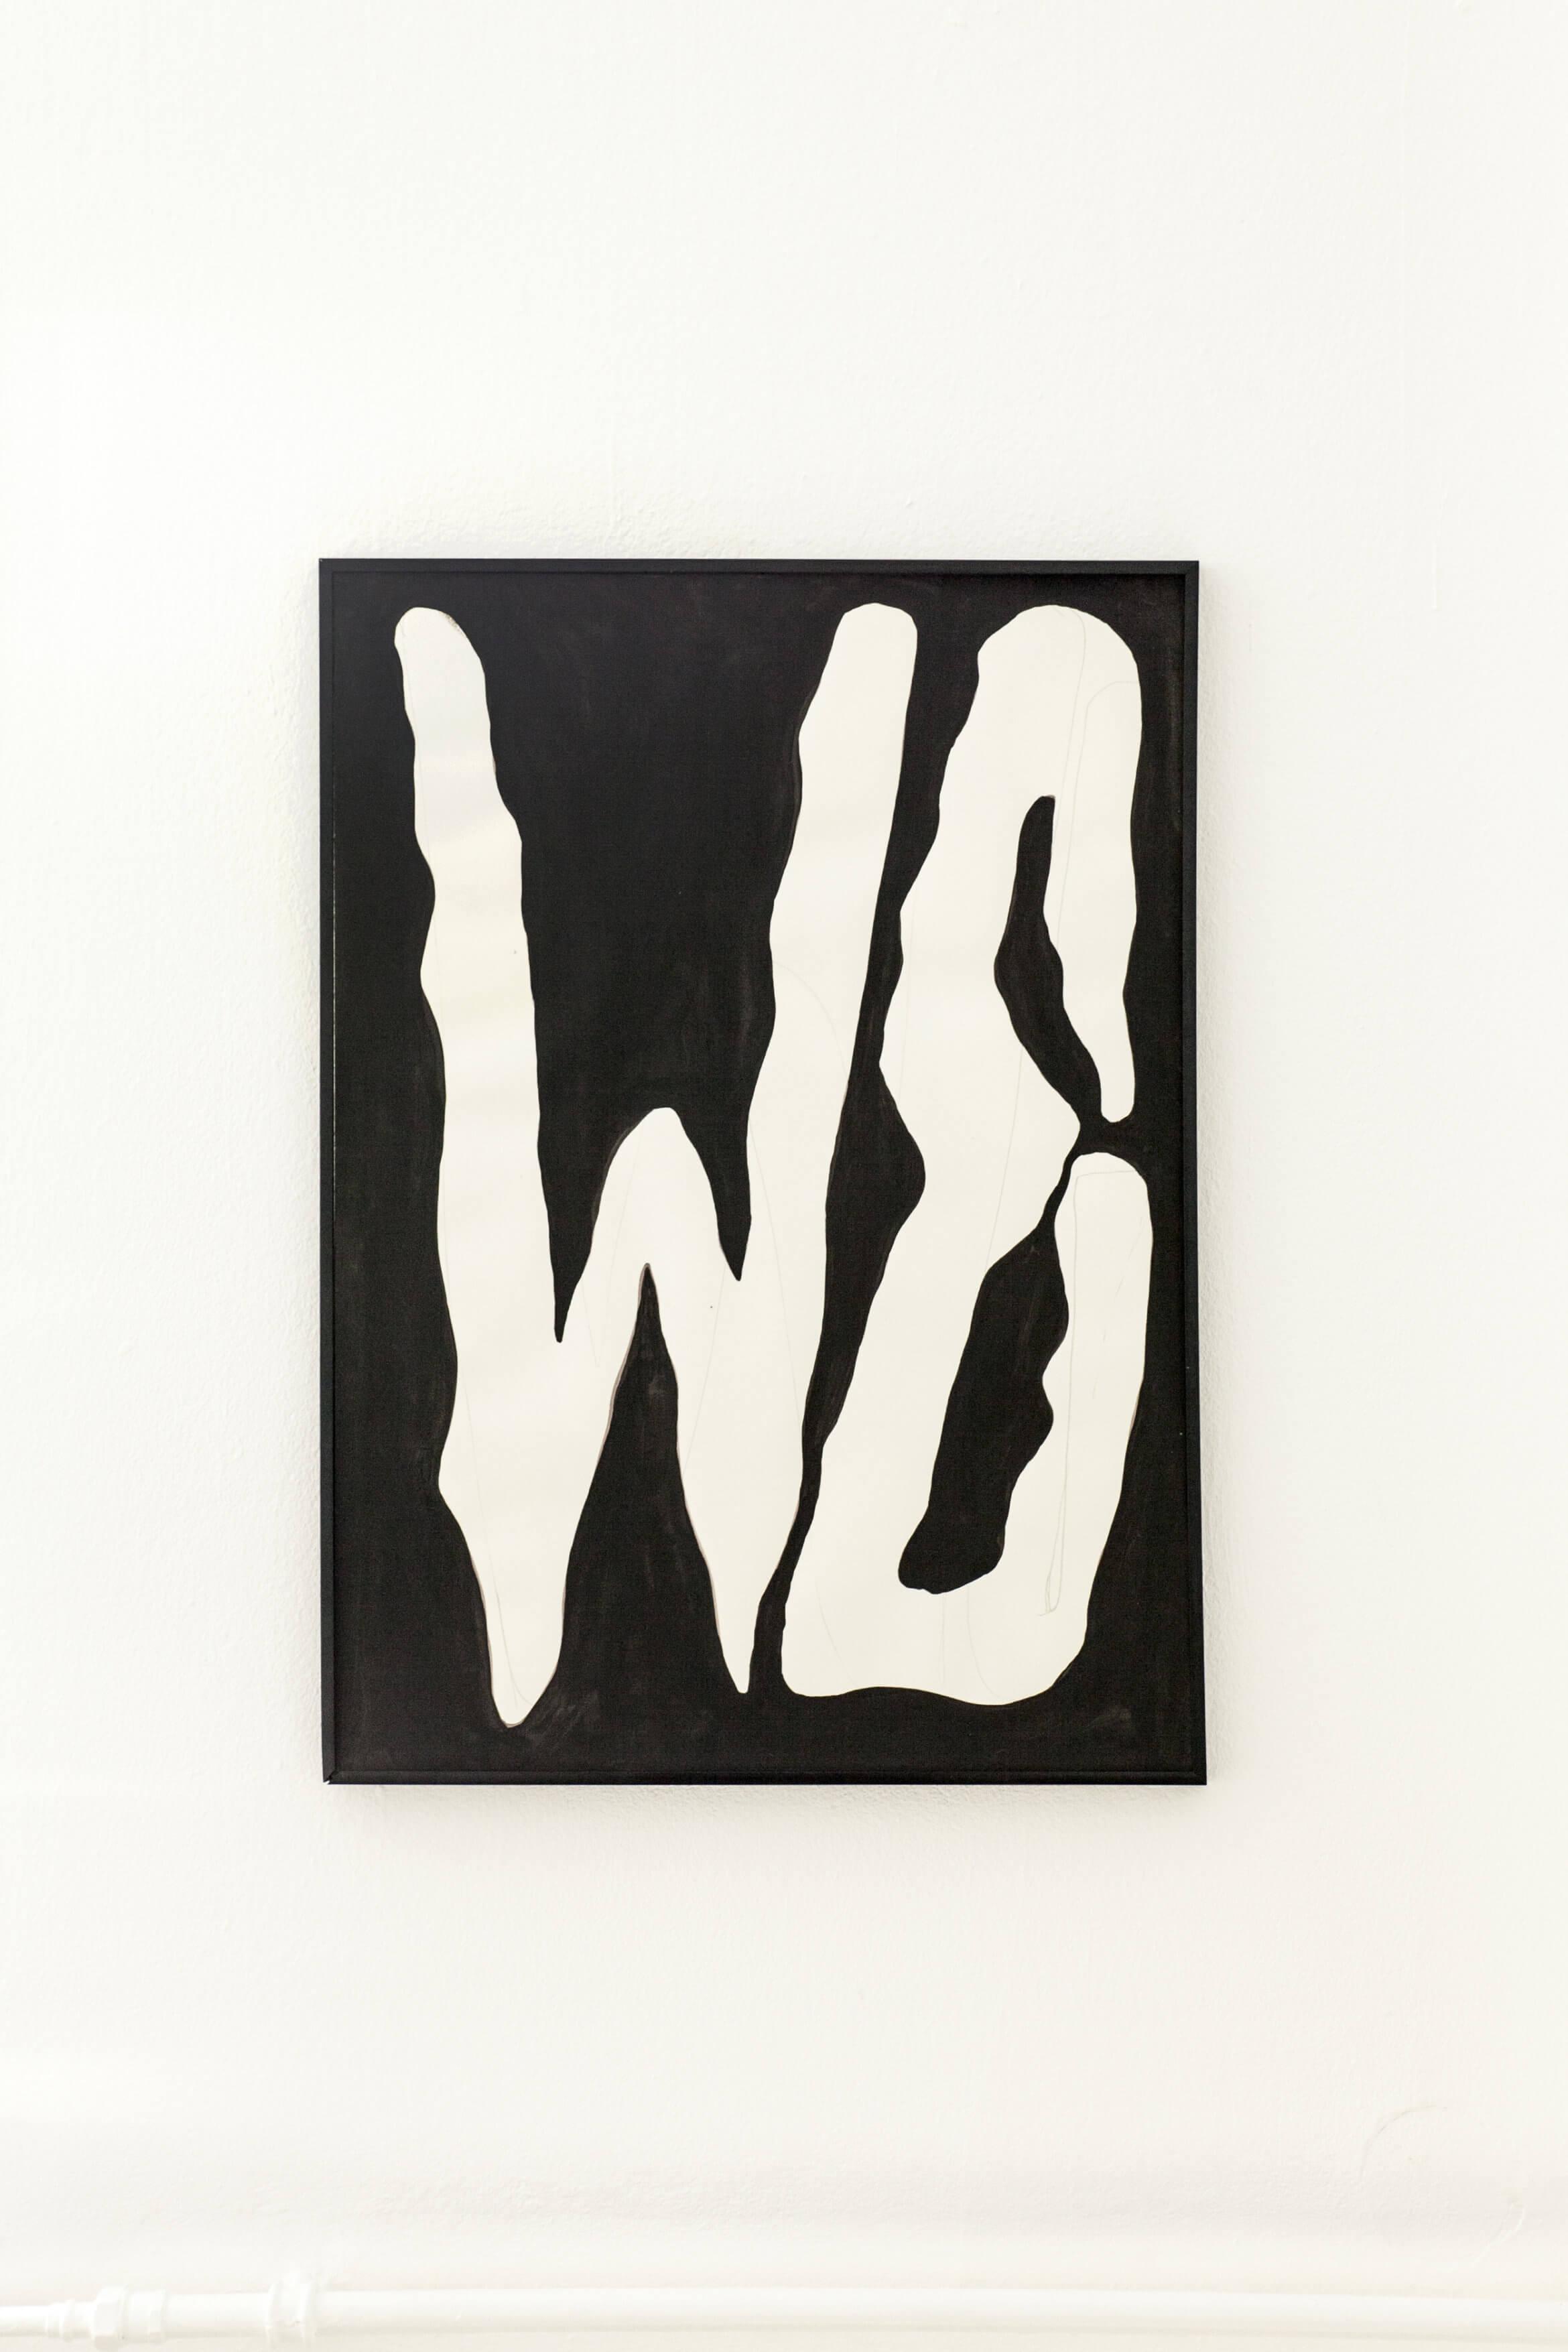 Daniel Angermann – Painting - WE 2